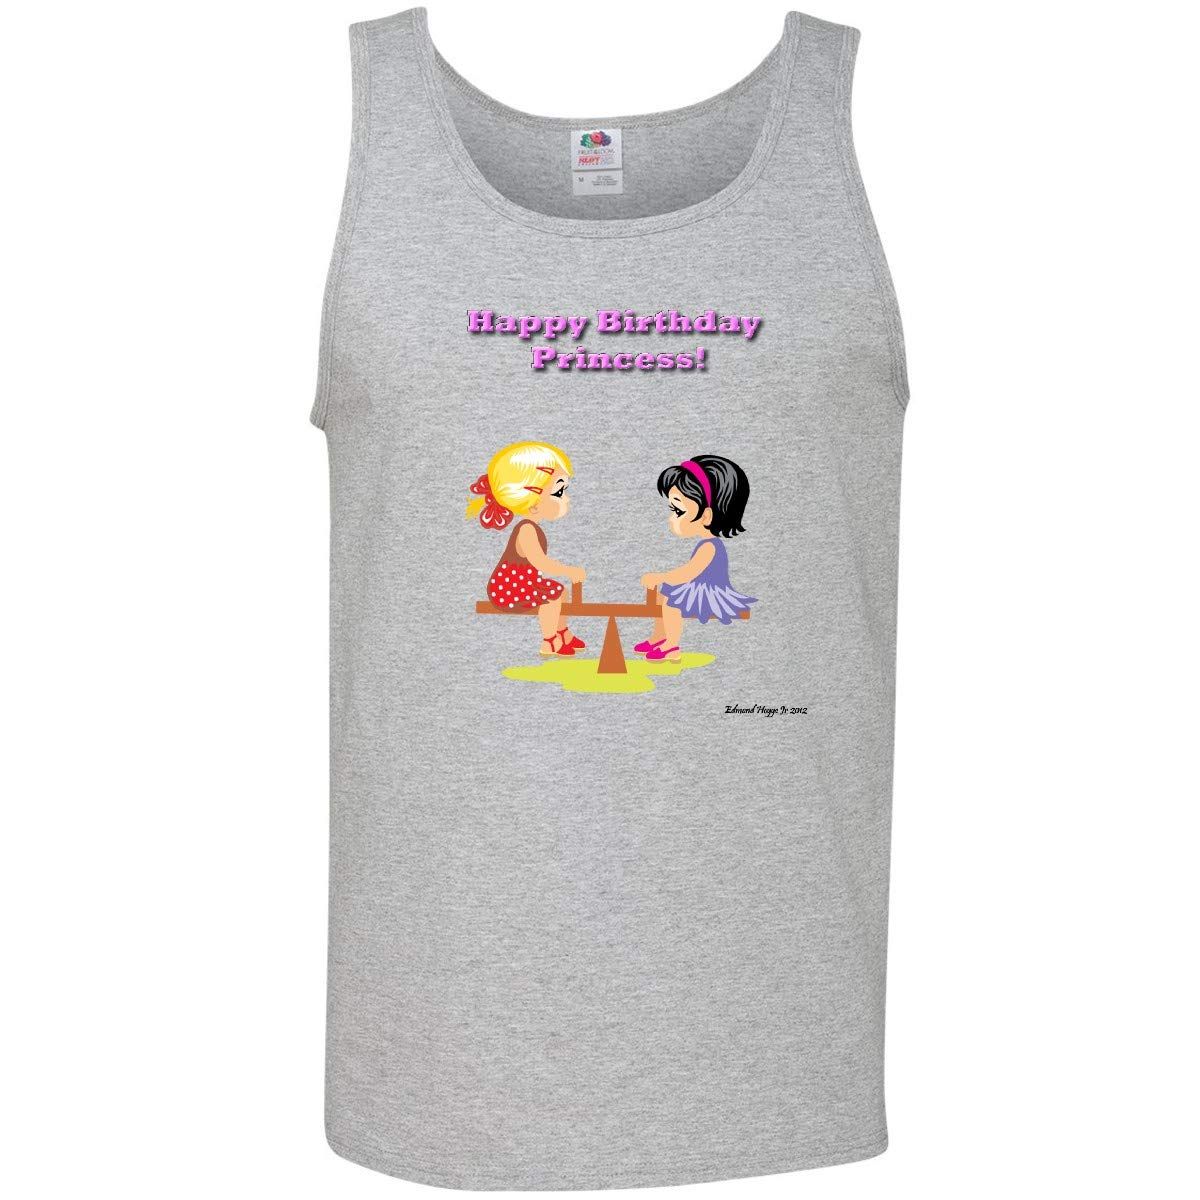 7655c2edc4f0e8 Amazon.com  inktastic - Birthday Girl on See-Saw Men s Tank Top 1151a   Clothing